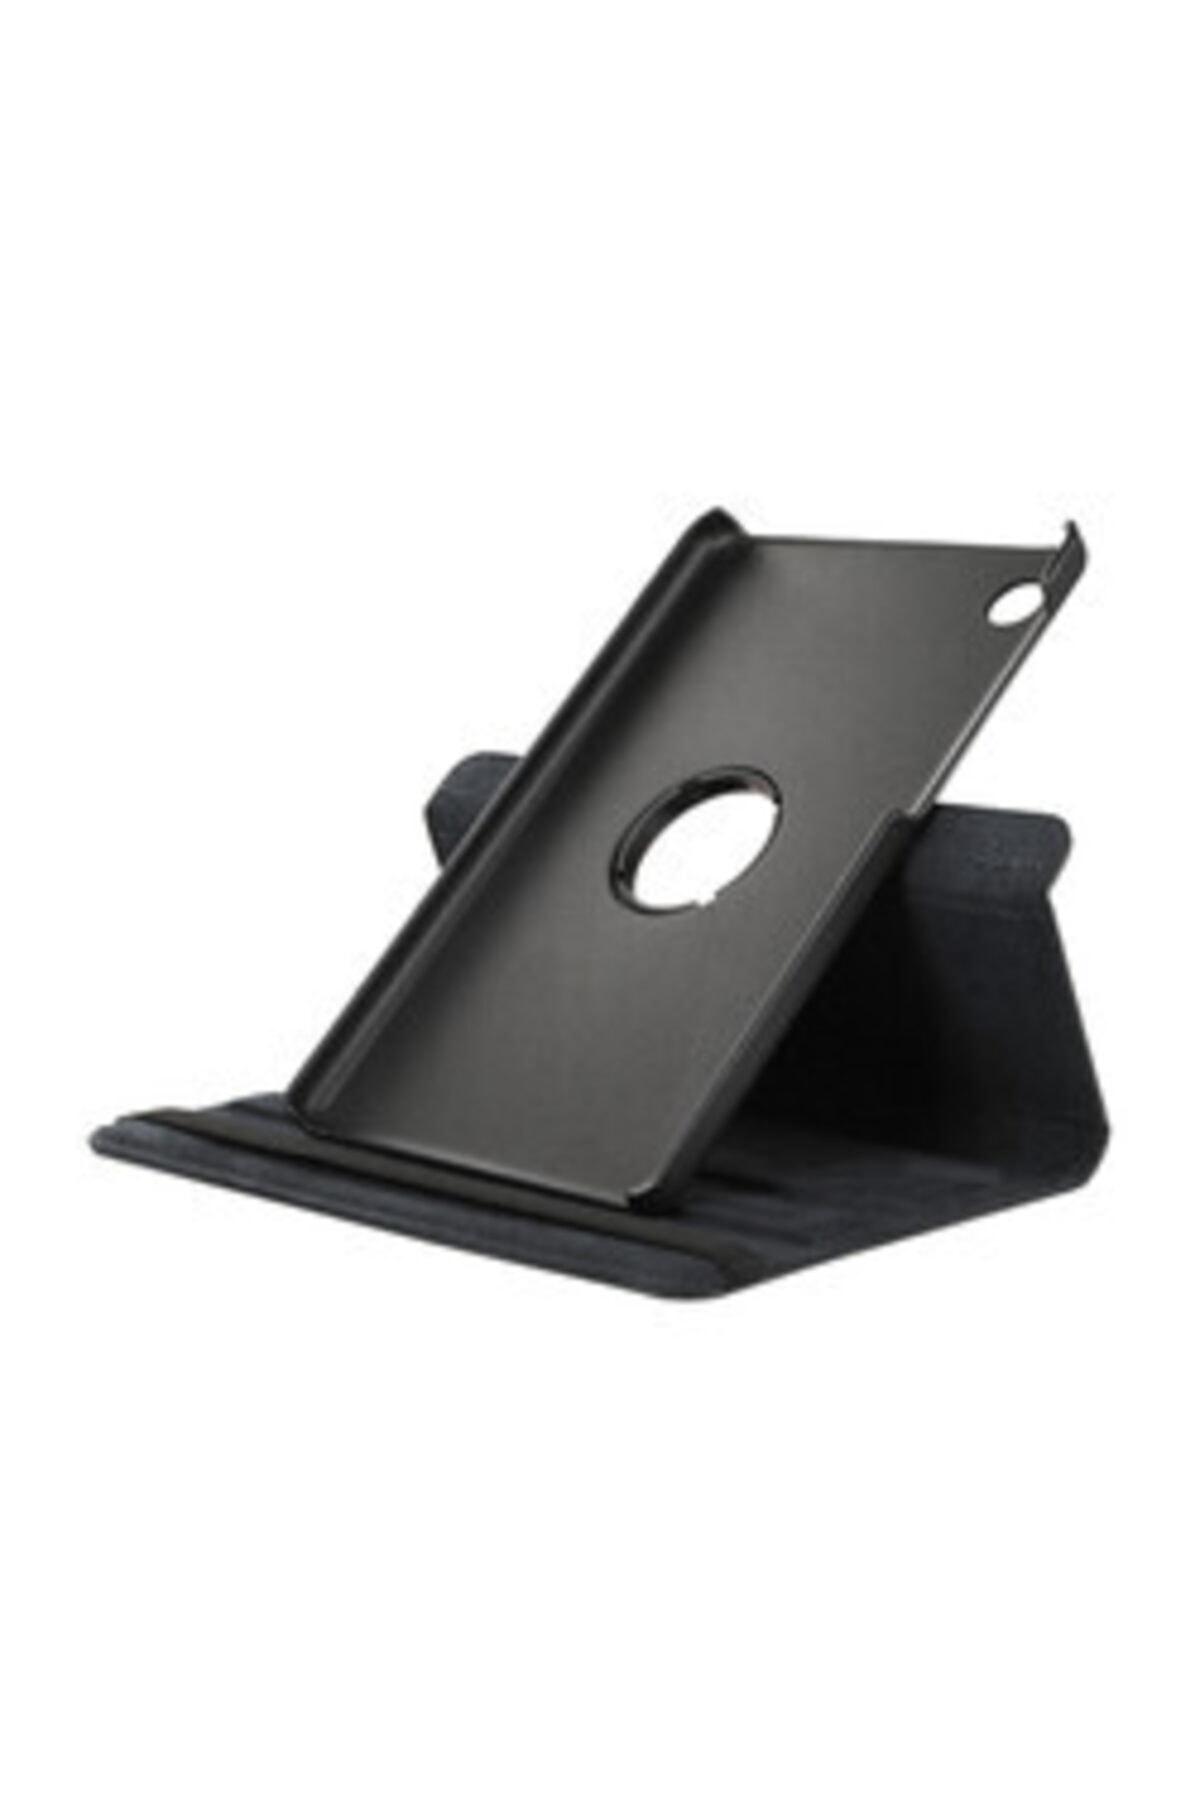 zore Huawei Mate Pad T10s 360 Dönebilen Standlı Kılıf 2